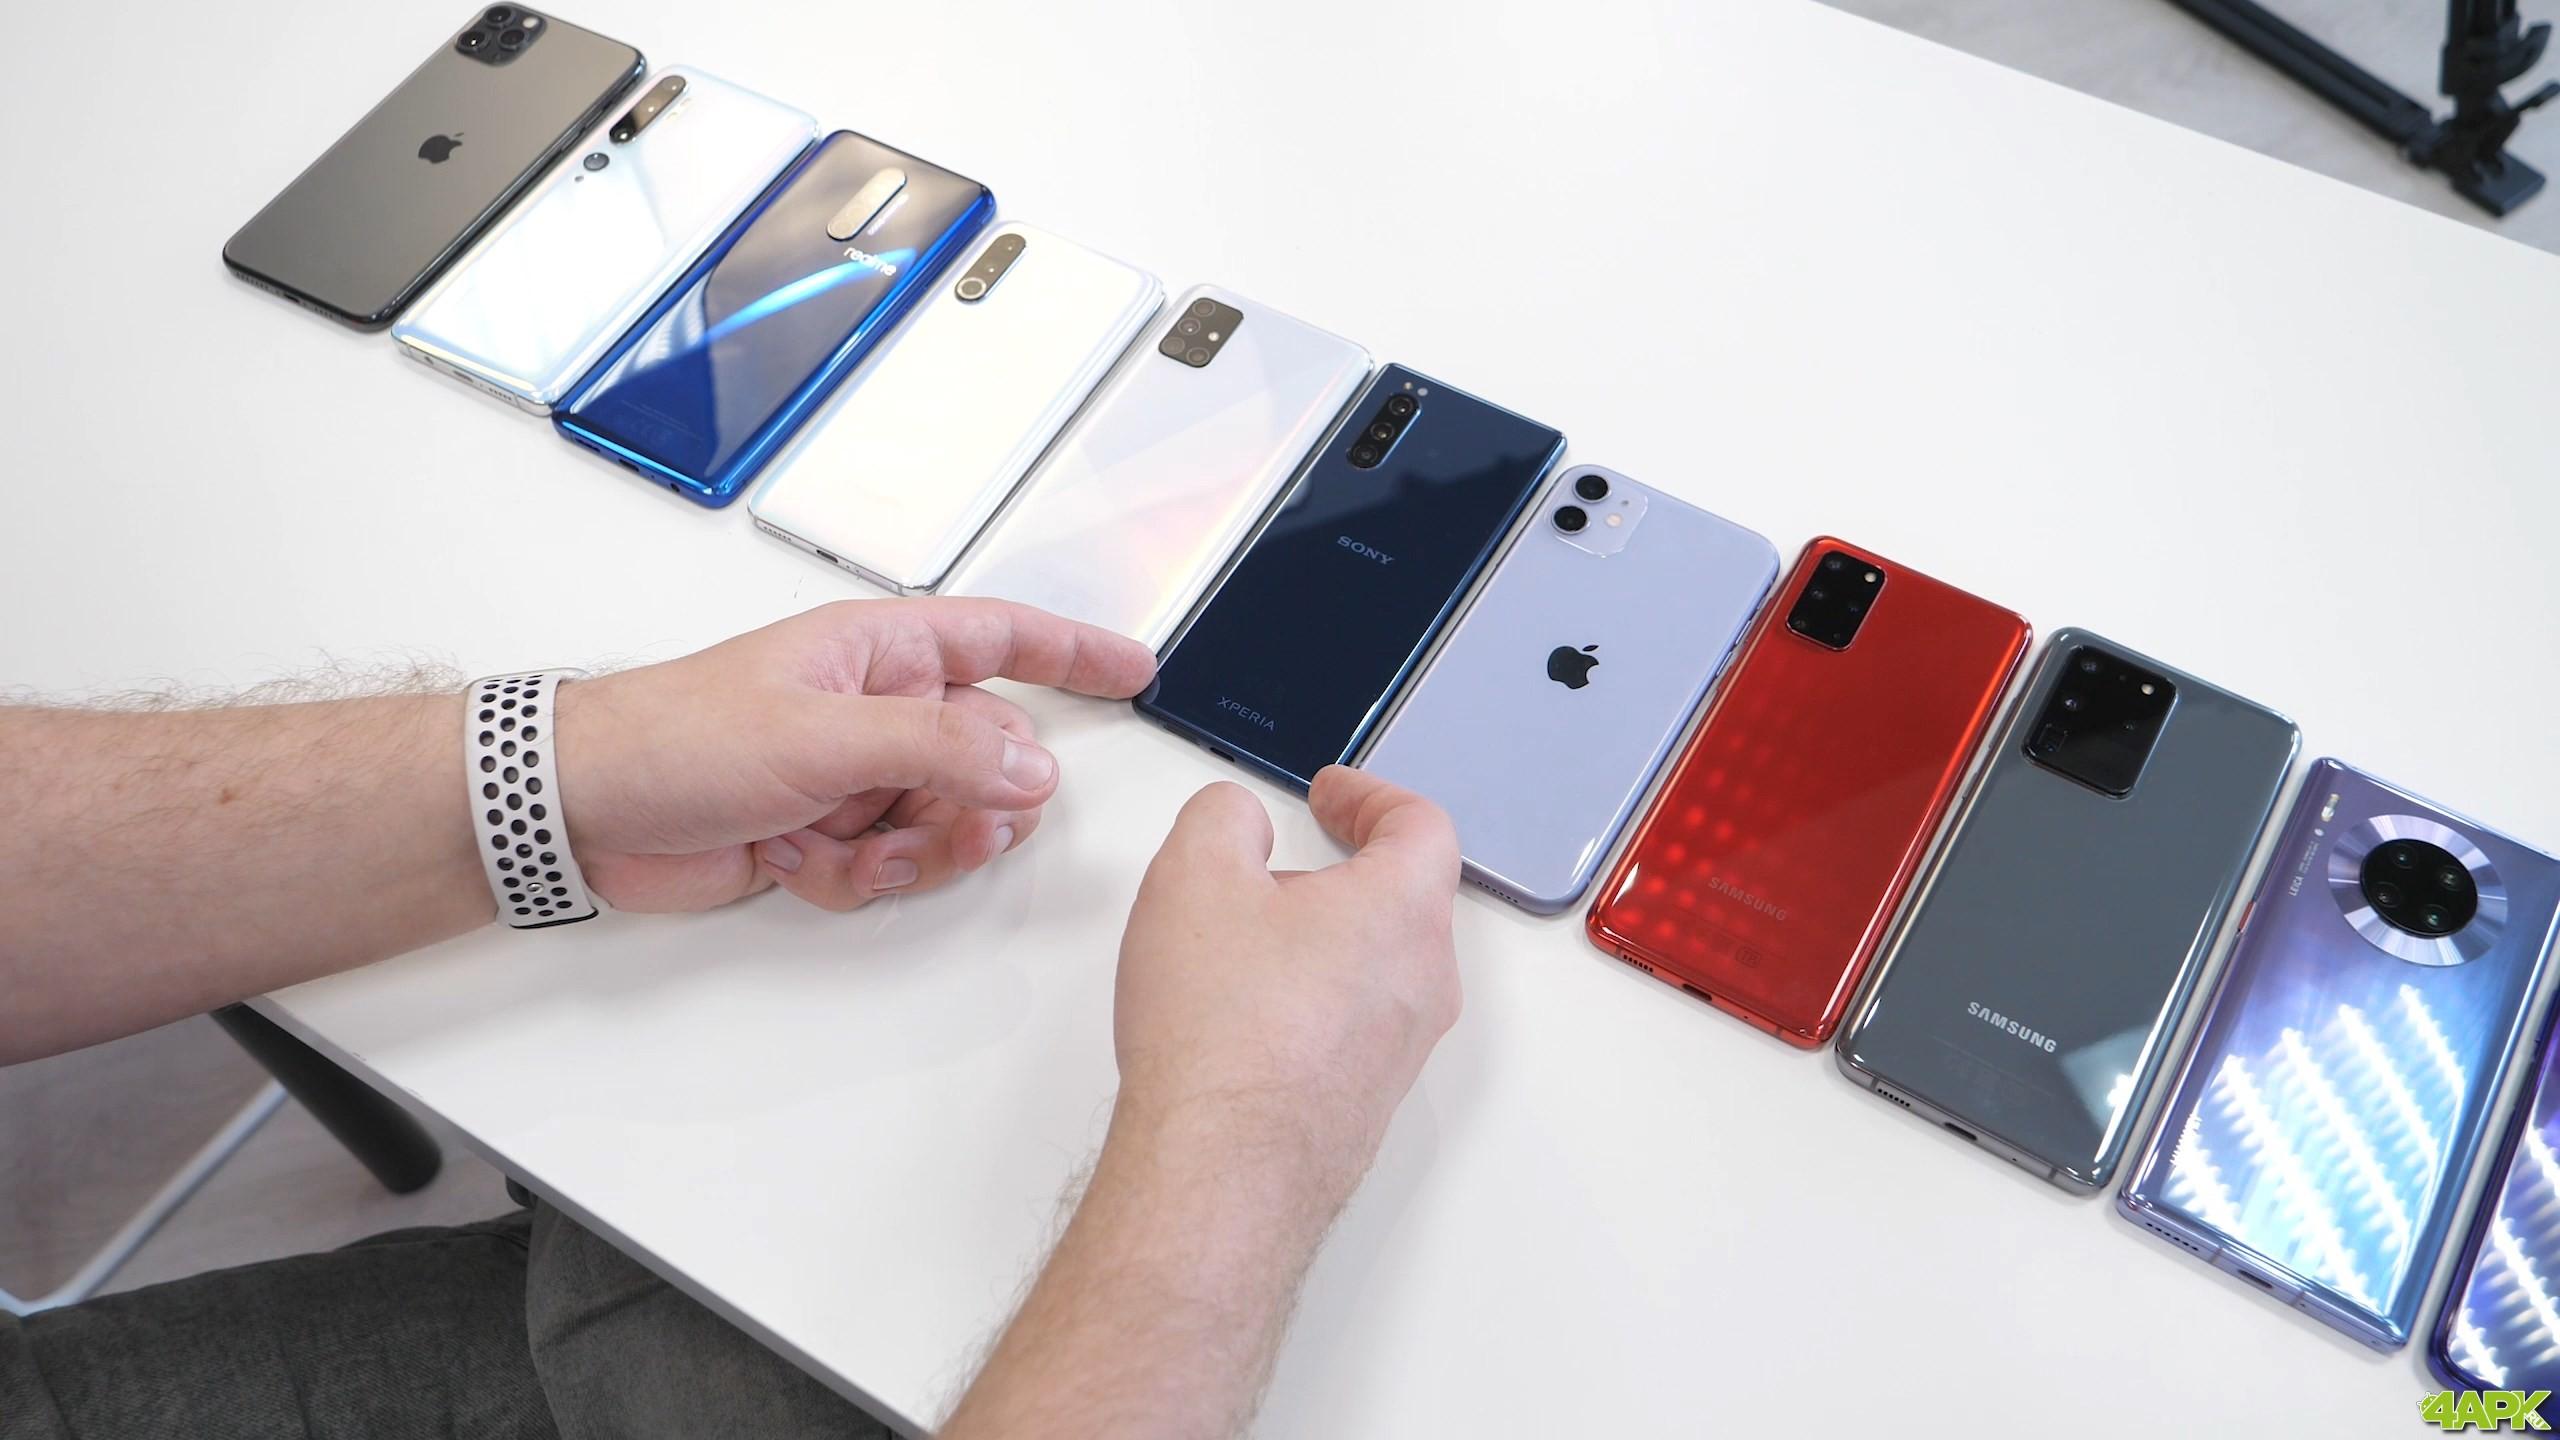 Обзор Sony Xperia 5: компактный смартфон с большим экраном Другие устройства  - obzor_sony_xperia_5_kompakt_s_bolshim_ekranom_picture42_0